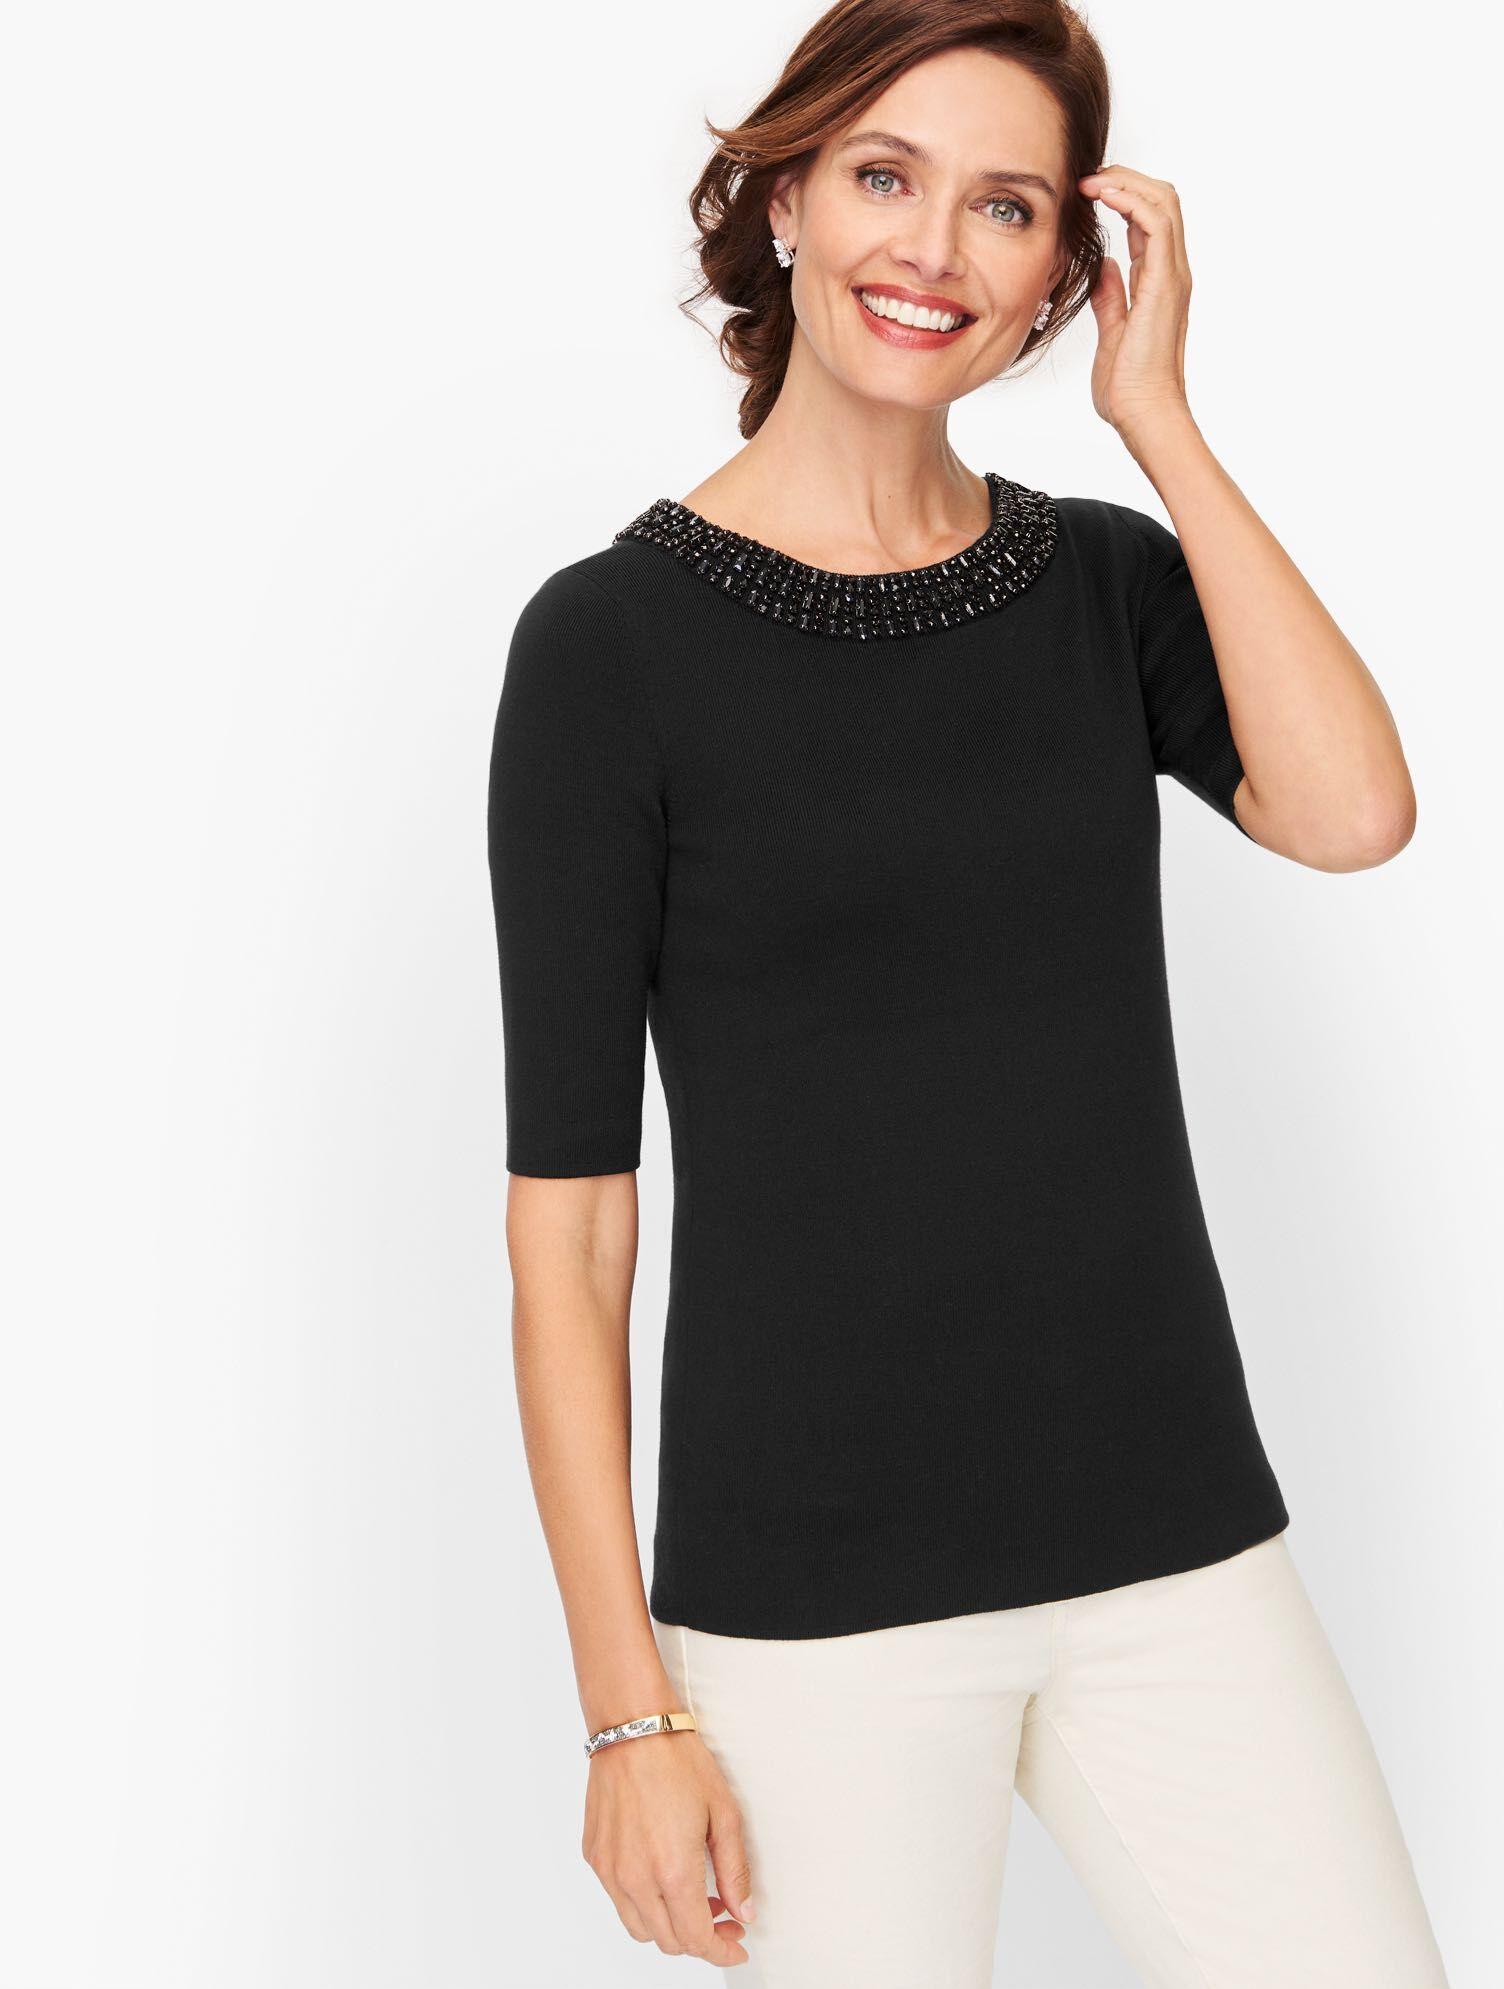 Talbots Embellished Cotton Blend Sweater - Black - XXS Talbots  - Black - Size: female - Size: 2X-Small